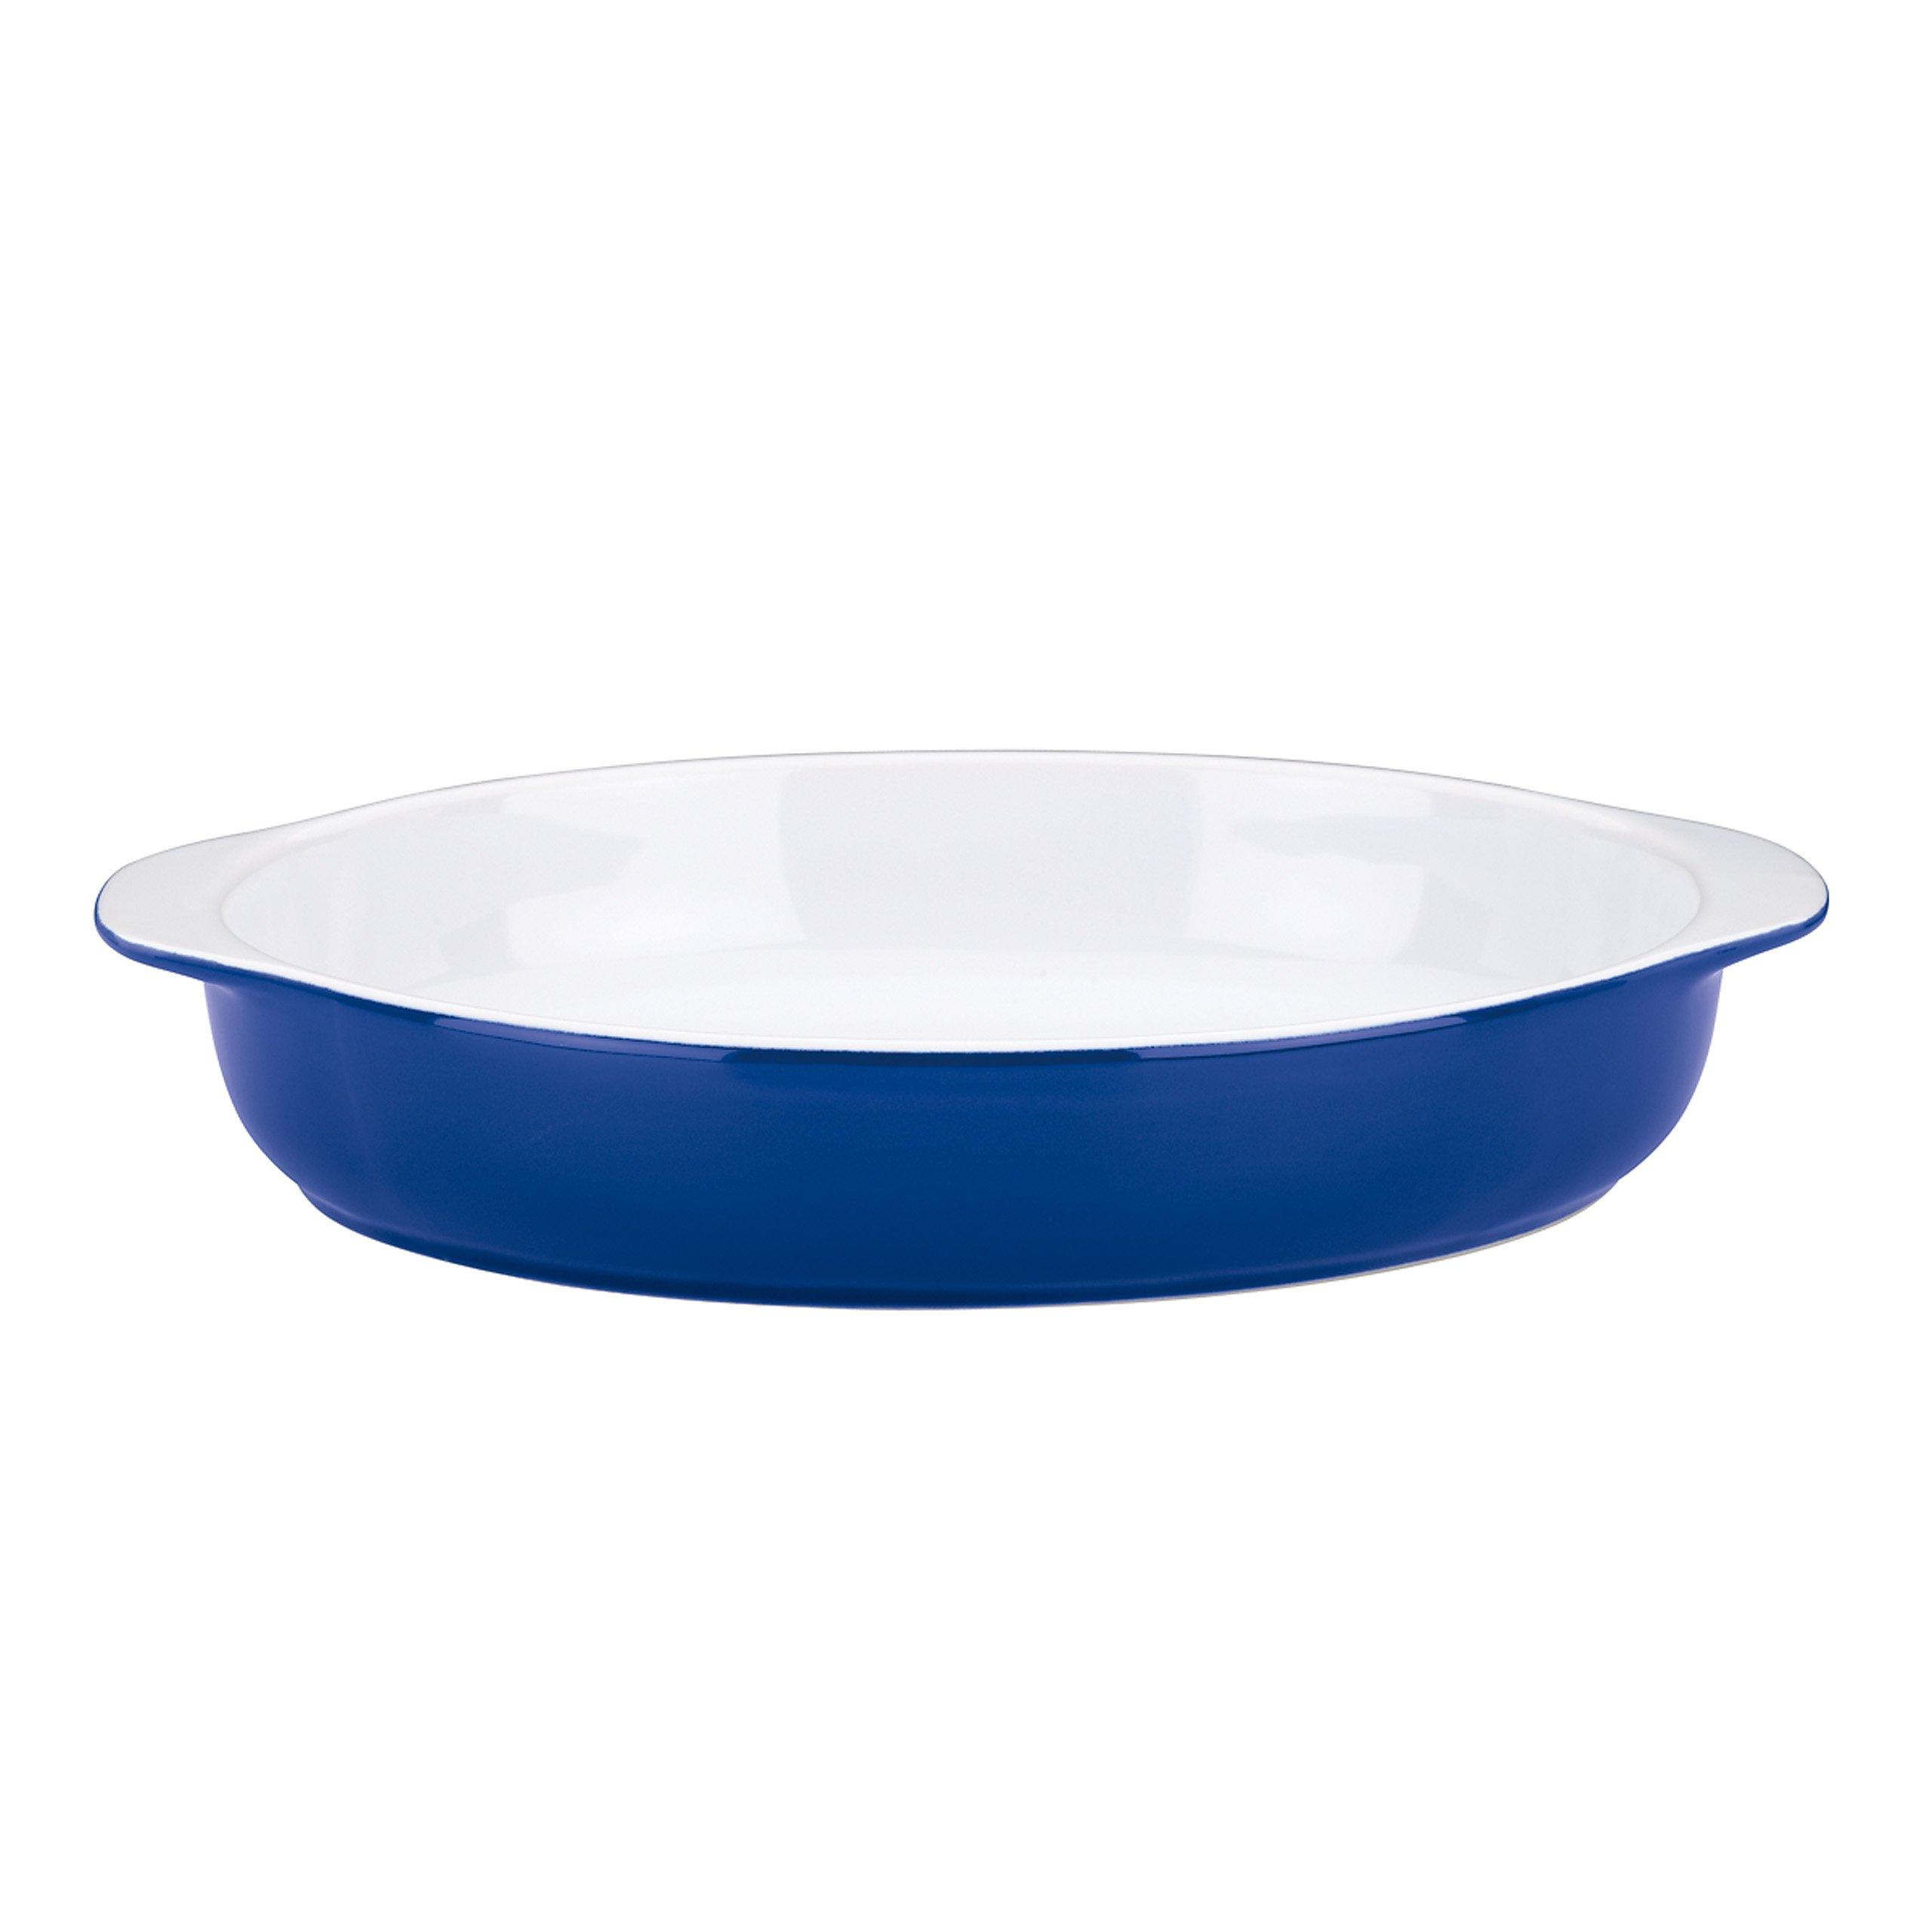 Mario Batali Stoneware 11.5-Inch Oval Au Gratin by Dansk, Cobalt Blue